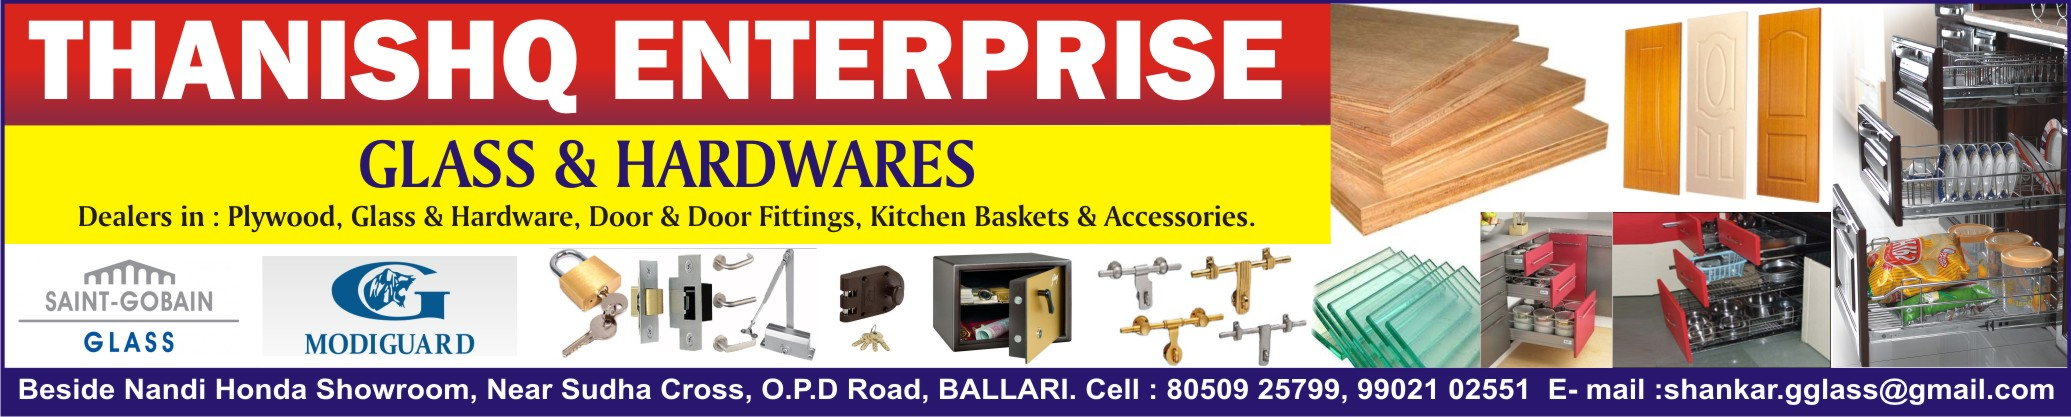 Thanishq Enterprises